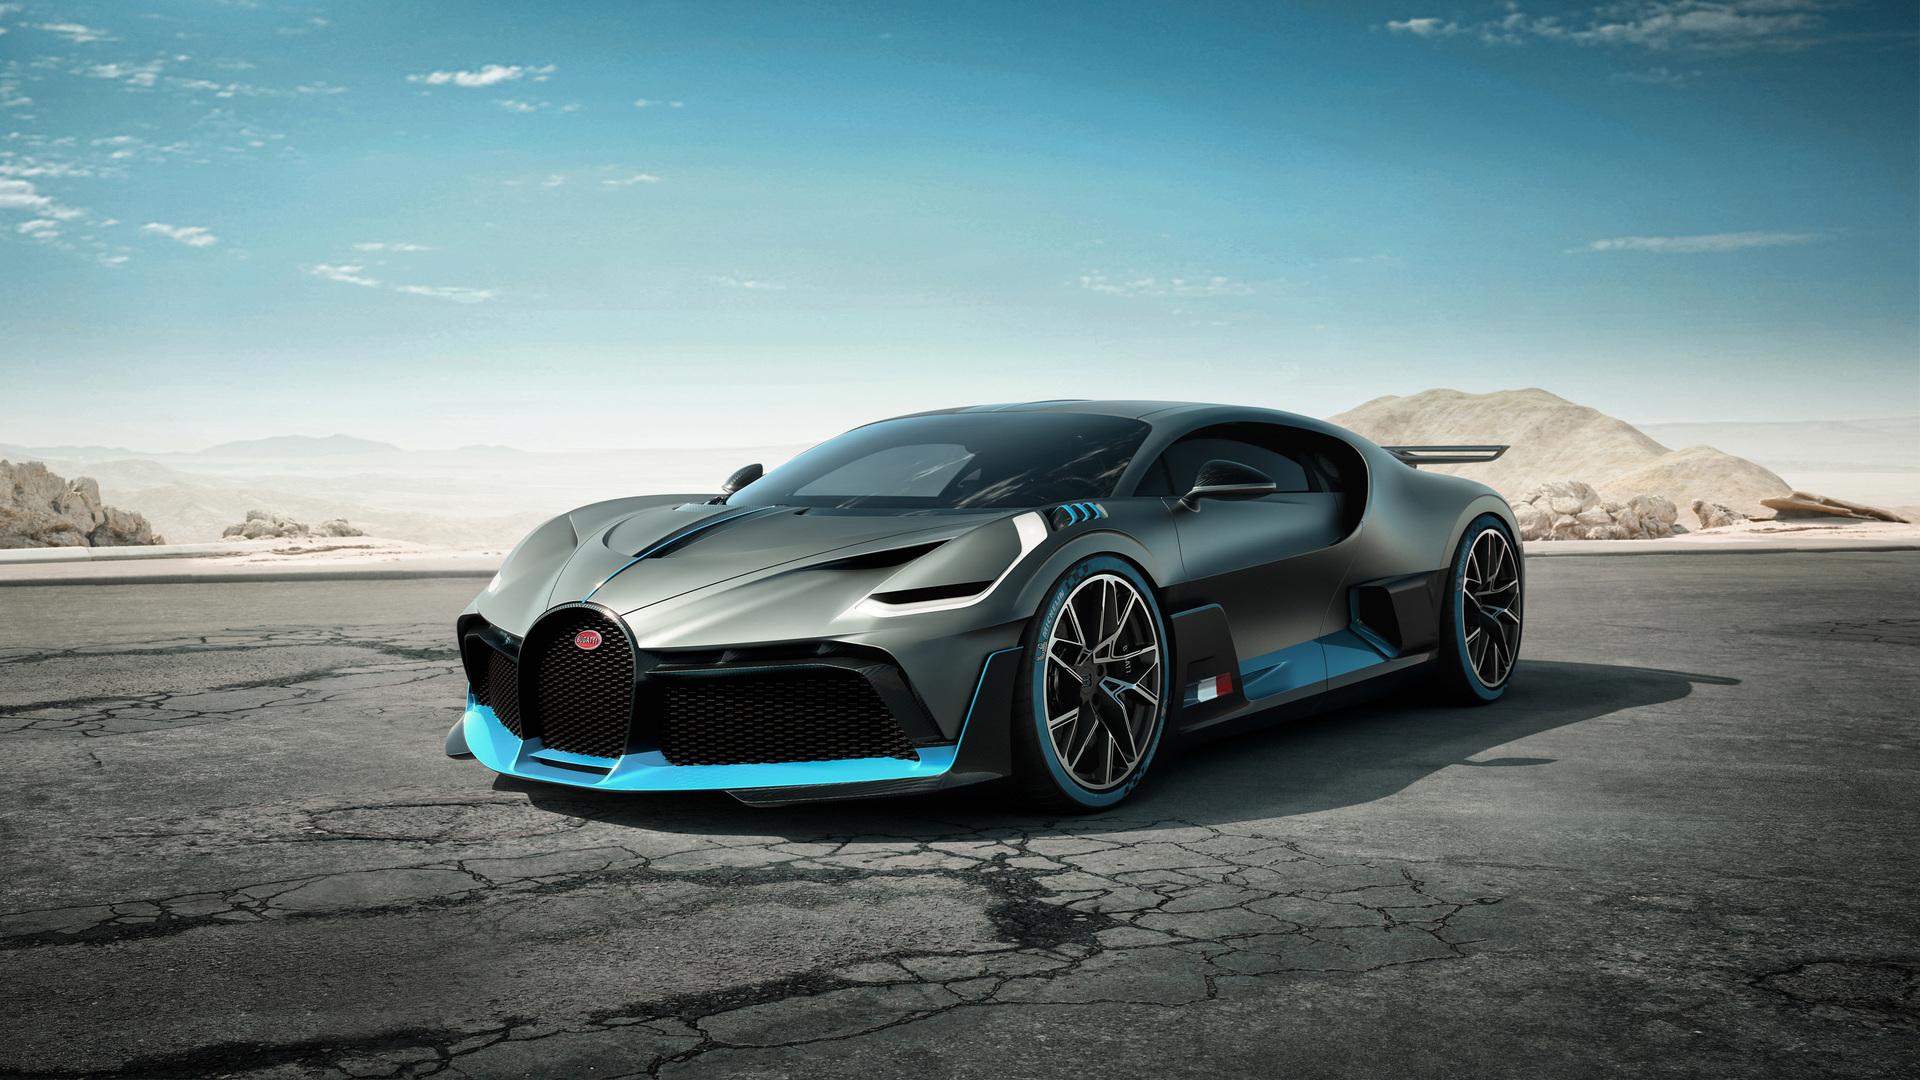 1920x1080 2018 bugatti divo laptop full hd 1080p hd 4k - Cars hd wallpapers for laptop ...